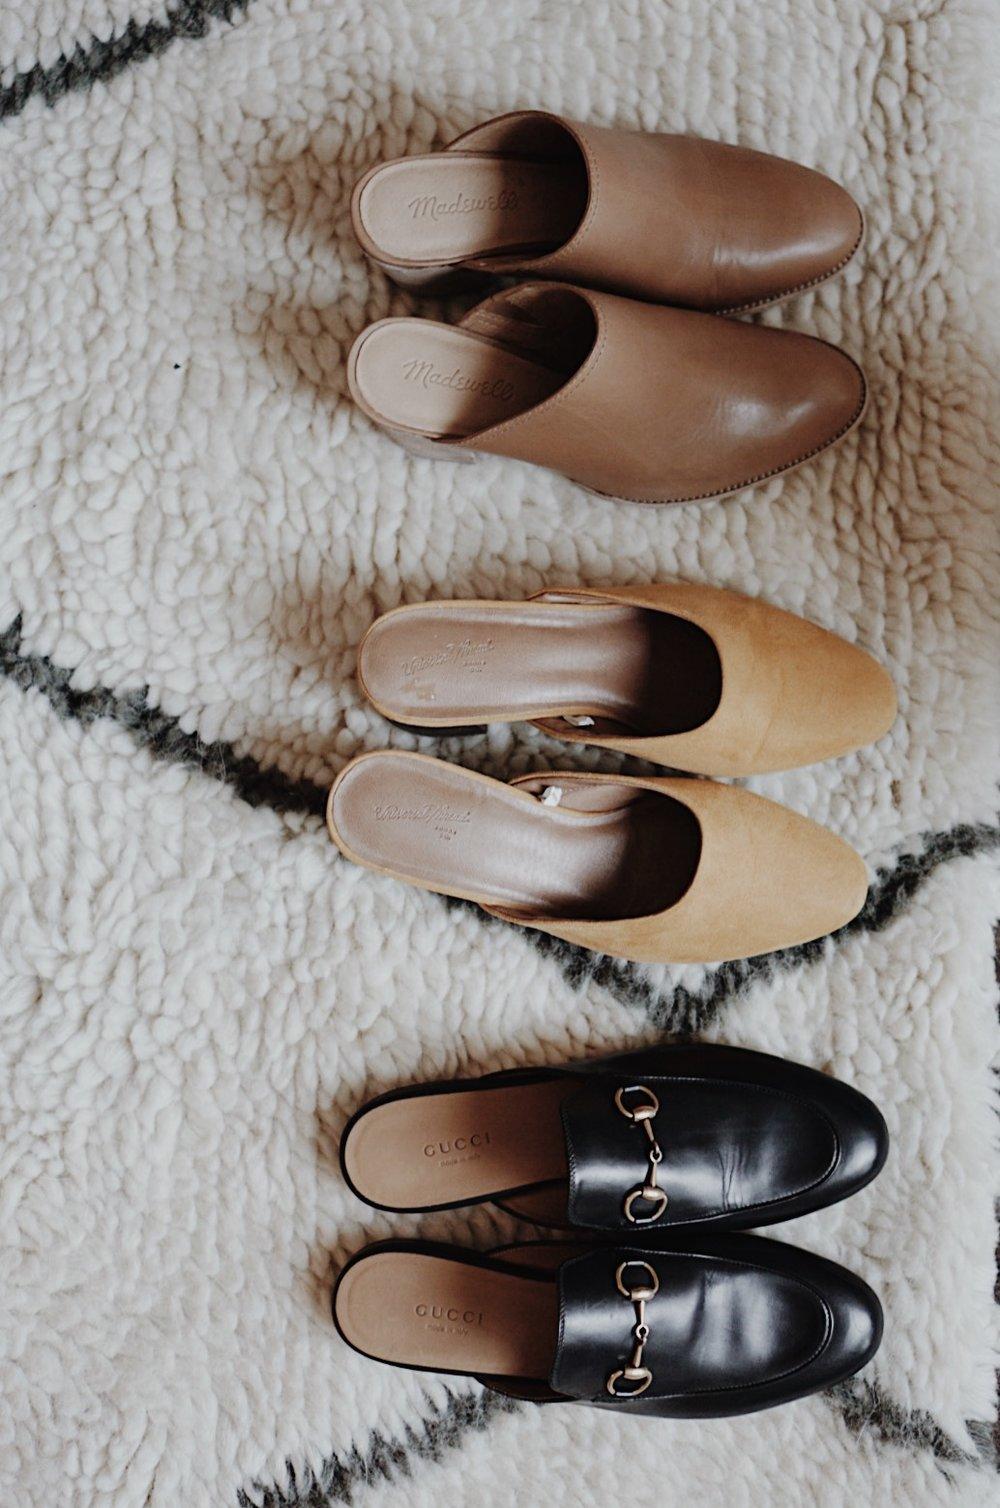 Summer Essentials Shoes: Madewell Harper Mule, Target Style Mustard Mule, Gucci Princetown Mule